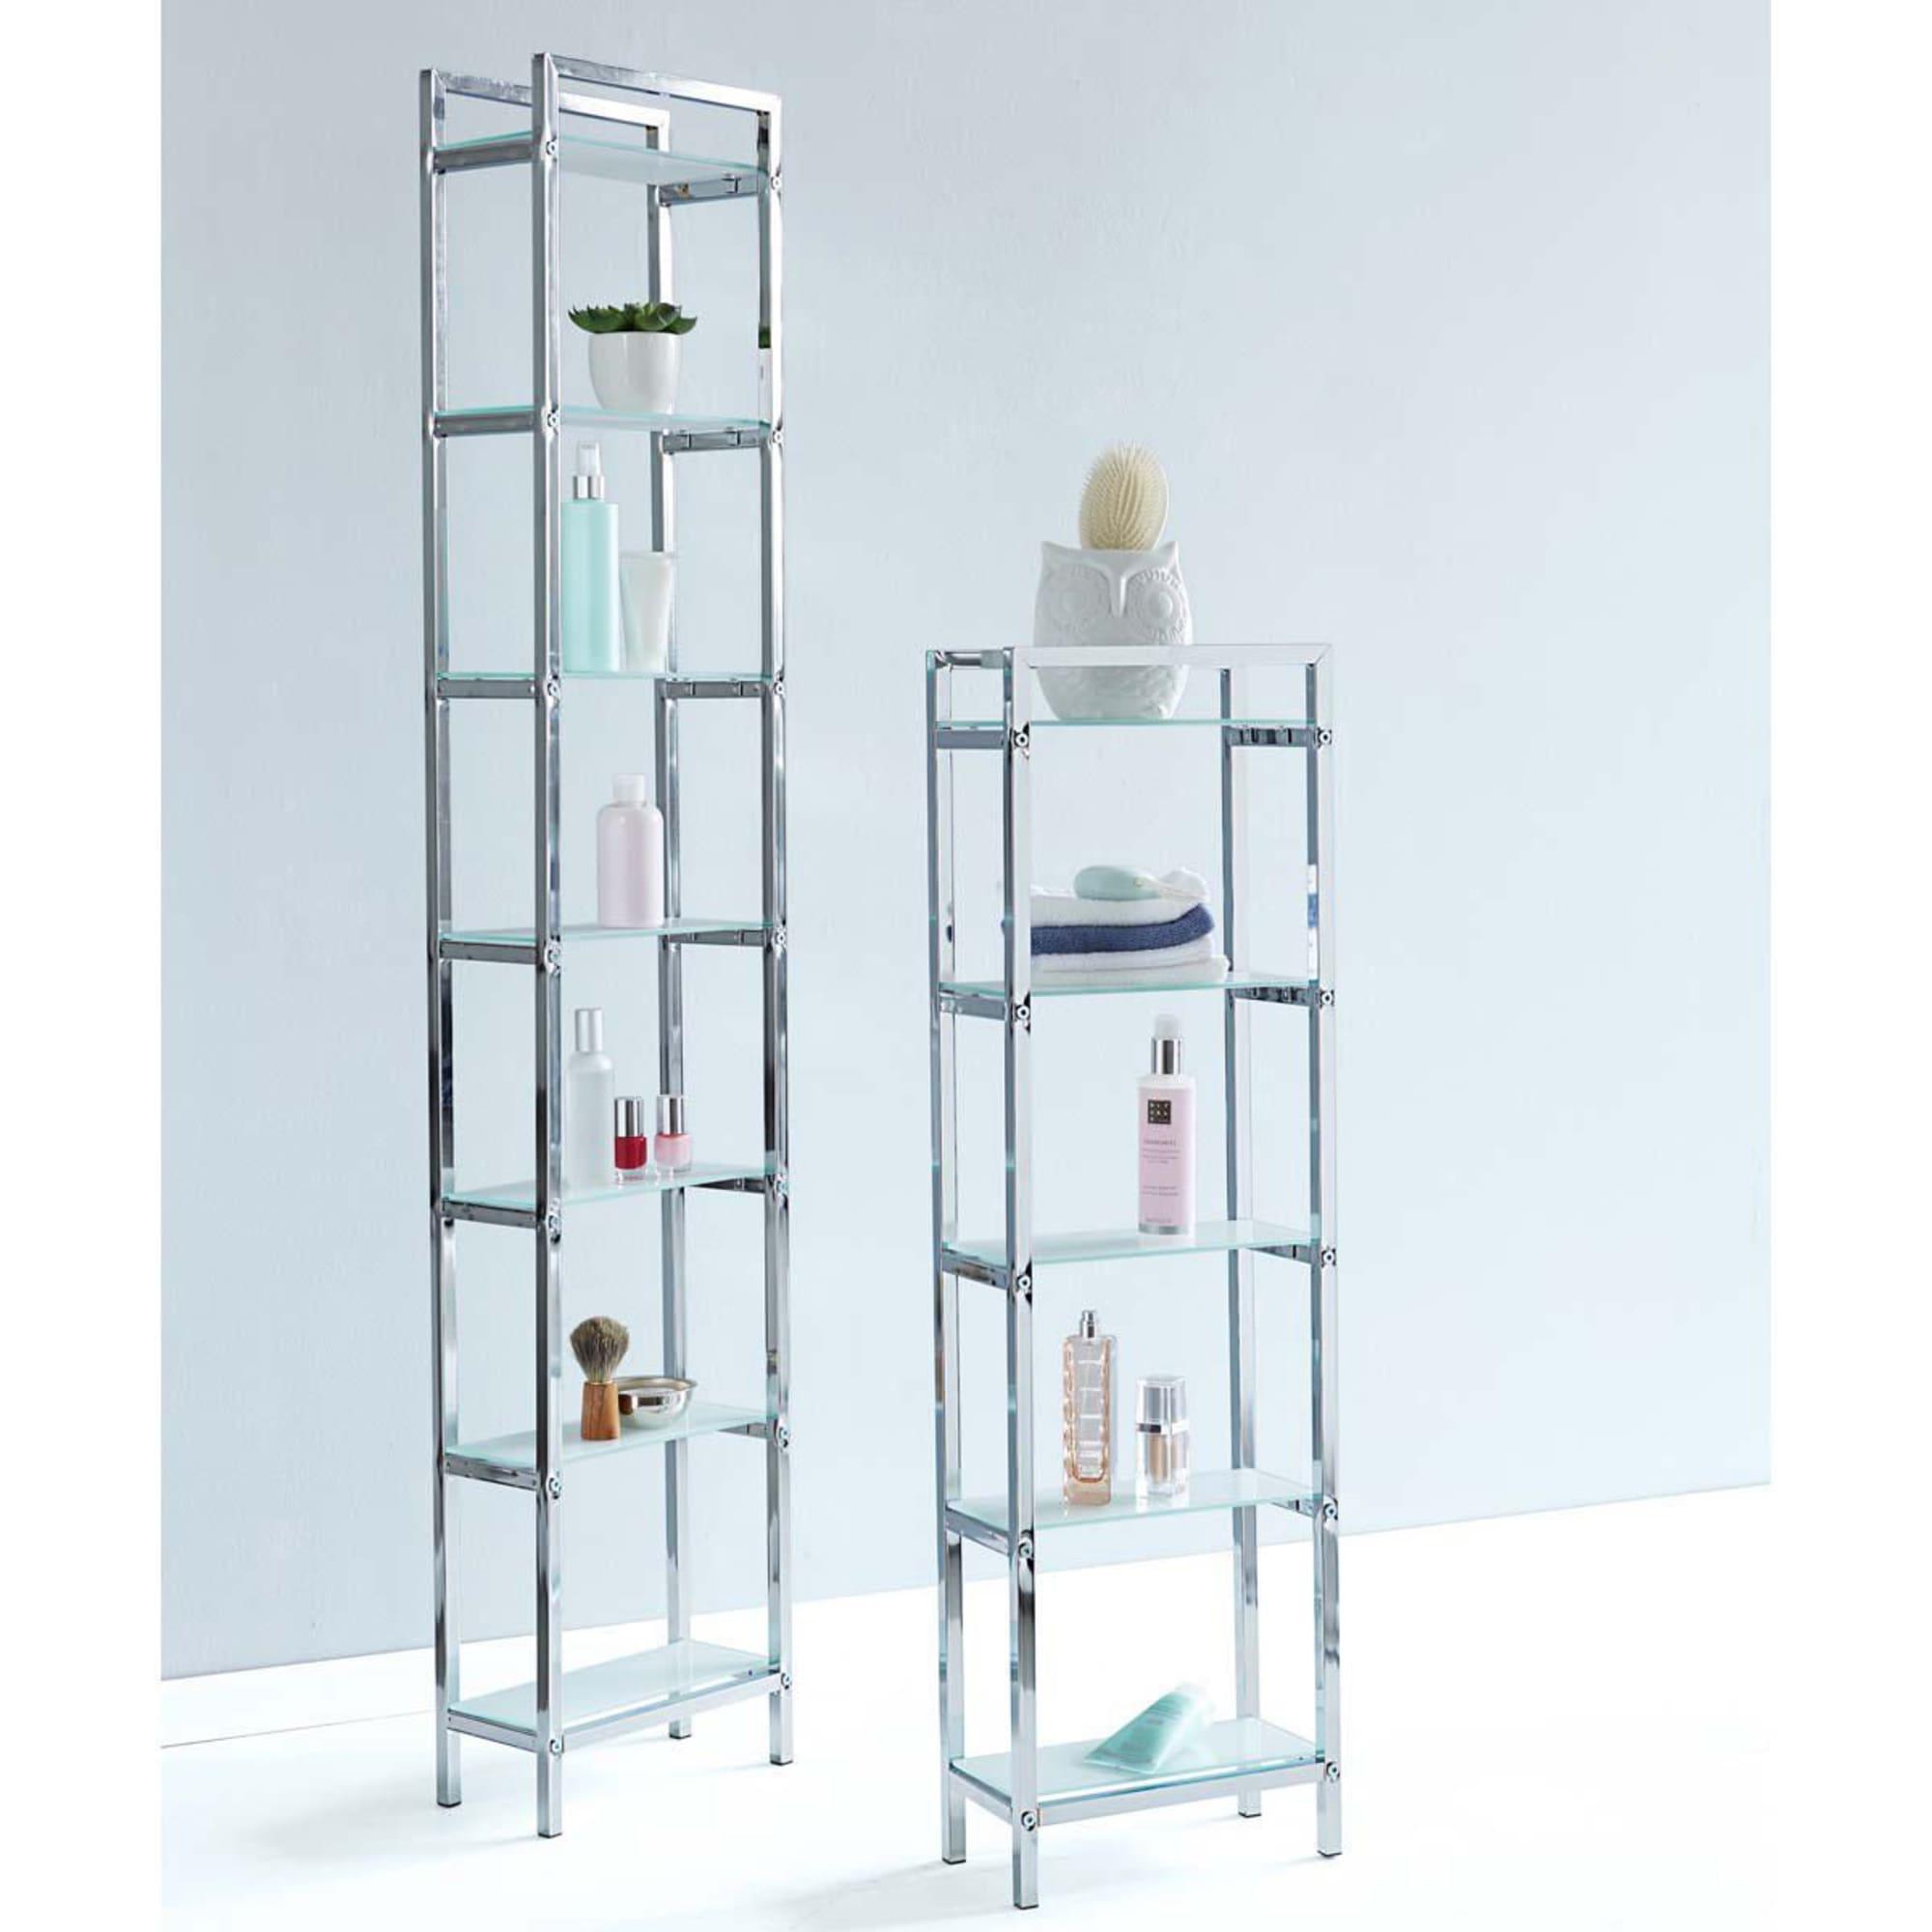 Regal Chrome, 7 Regalböden, Glas, Tiefe 15cm